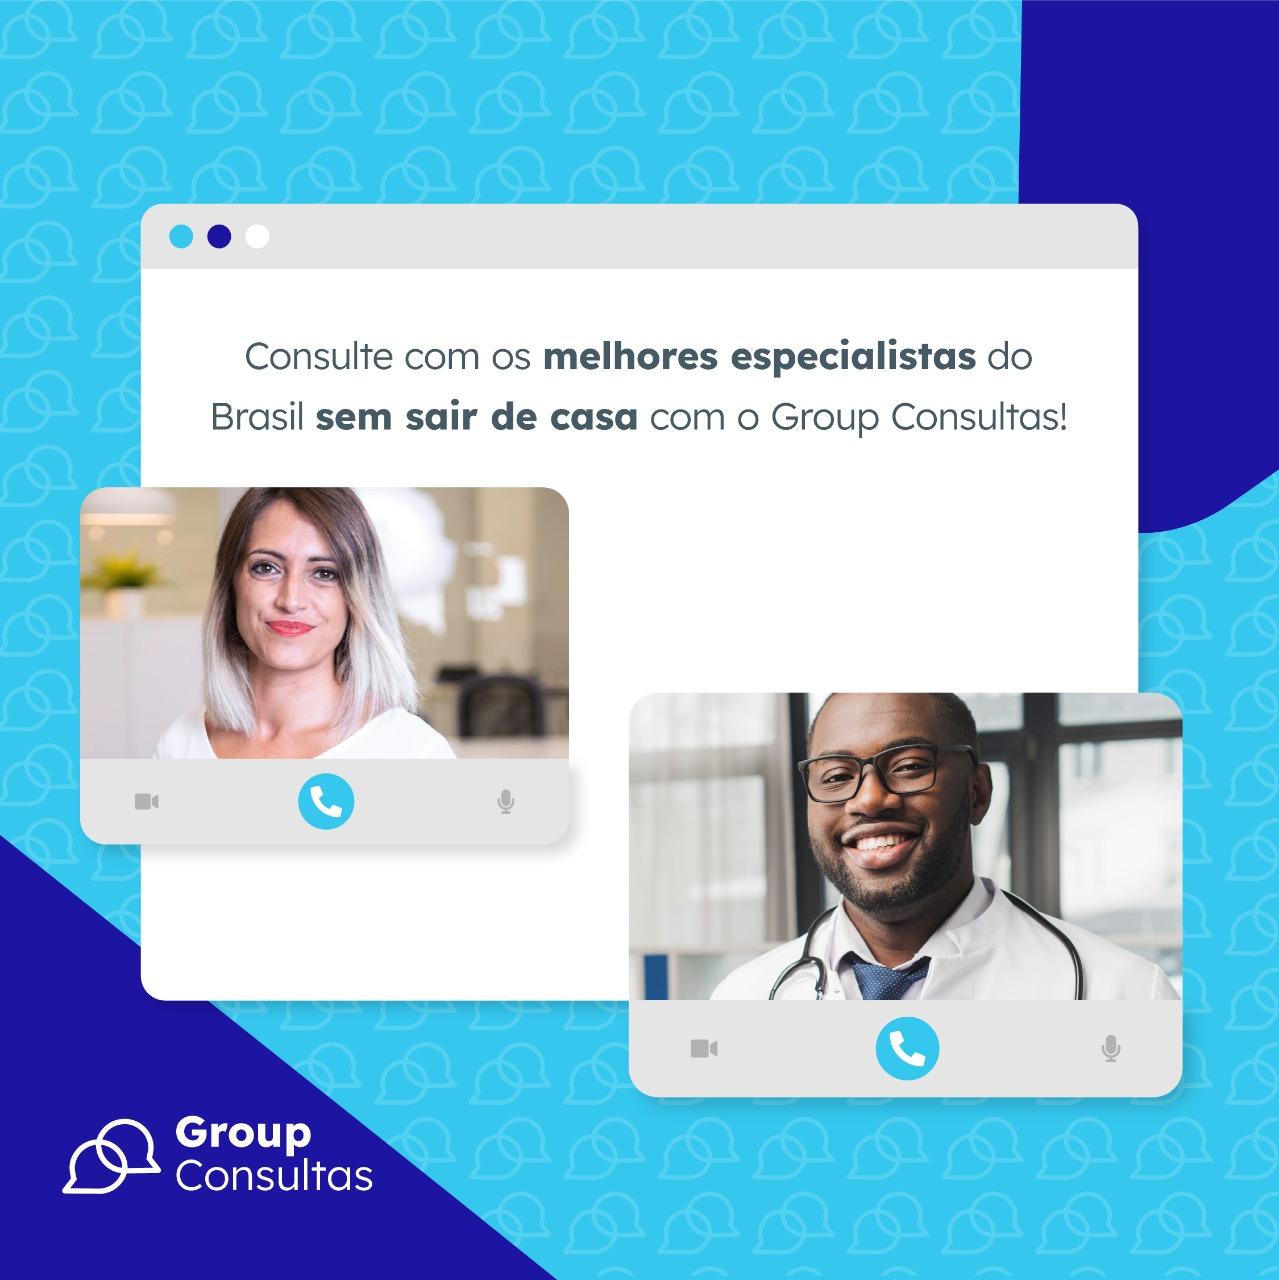 WhatsApp Image 2021 09 22 at 16.05.55 1 003 - 25 razões para inserir a Group Consultas na sua vida